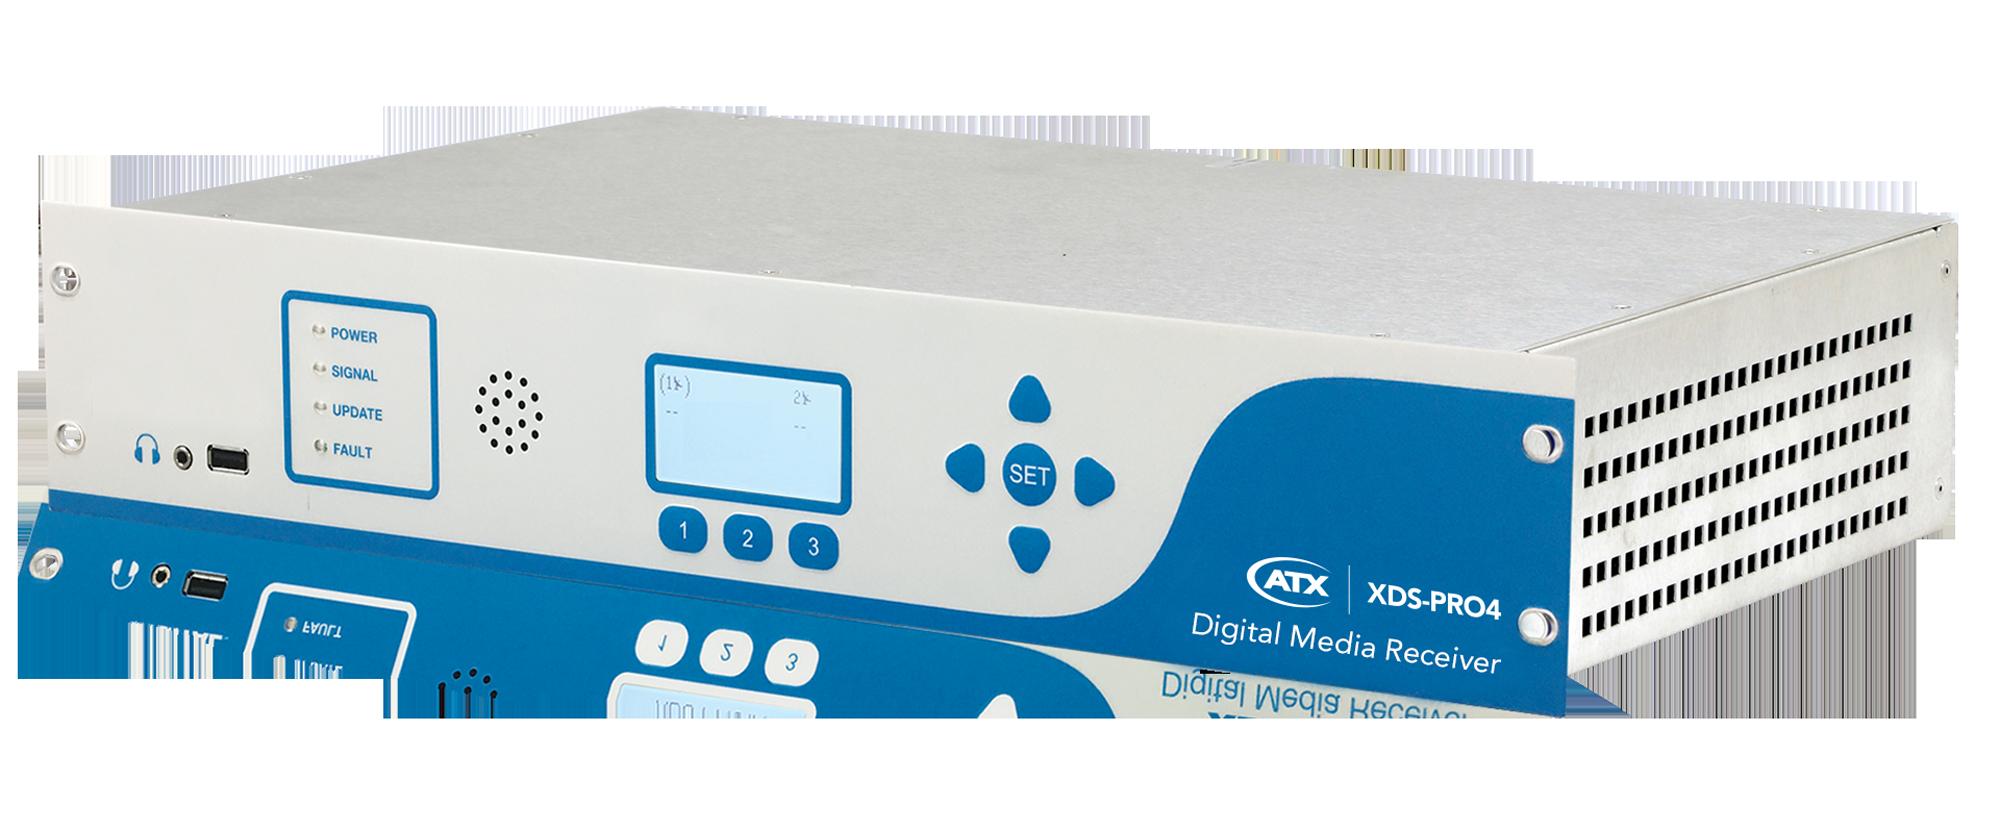 XDS-PRO4 Audio Digital Media Receiver - ATX Networks